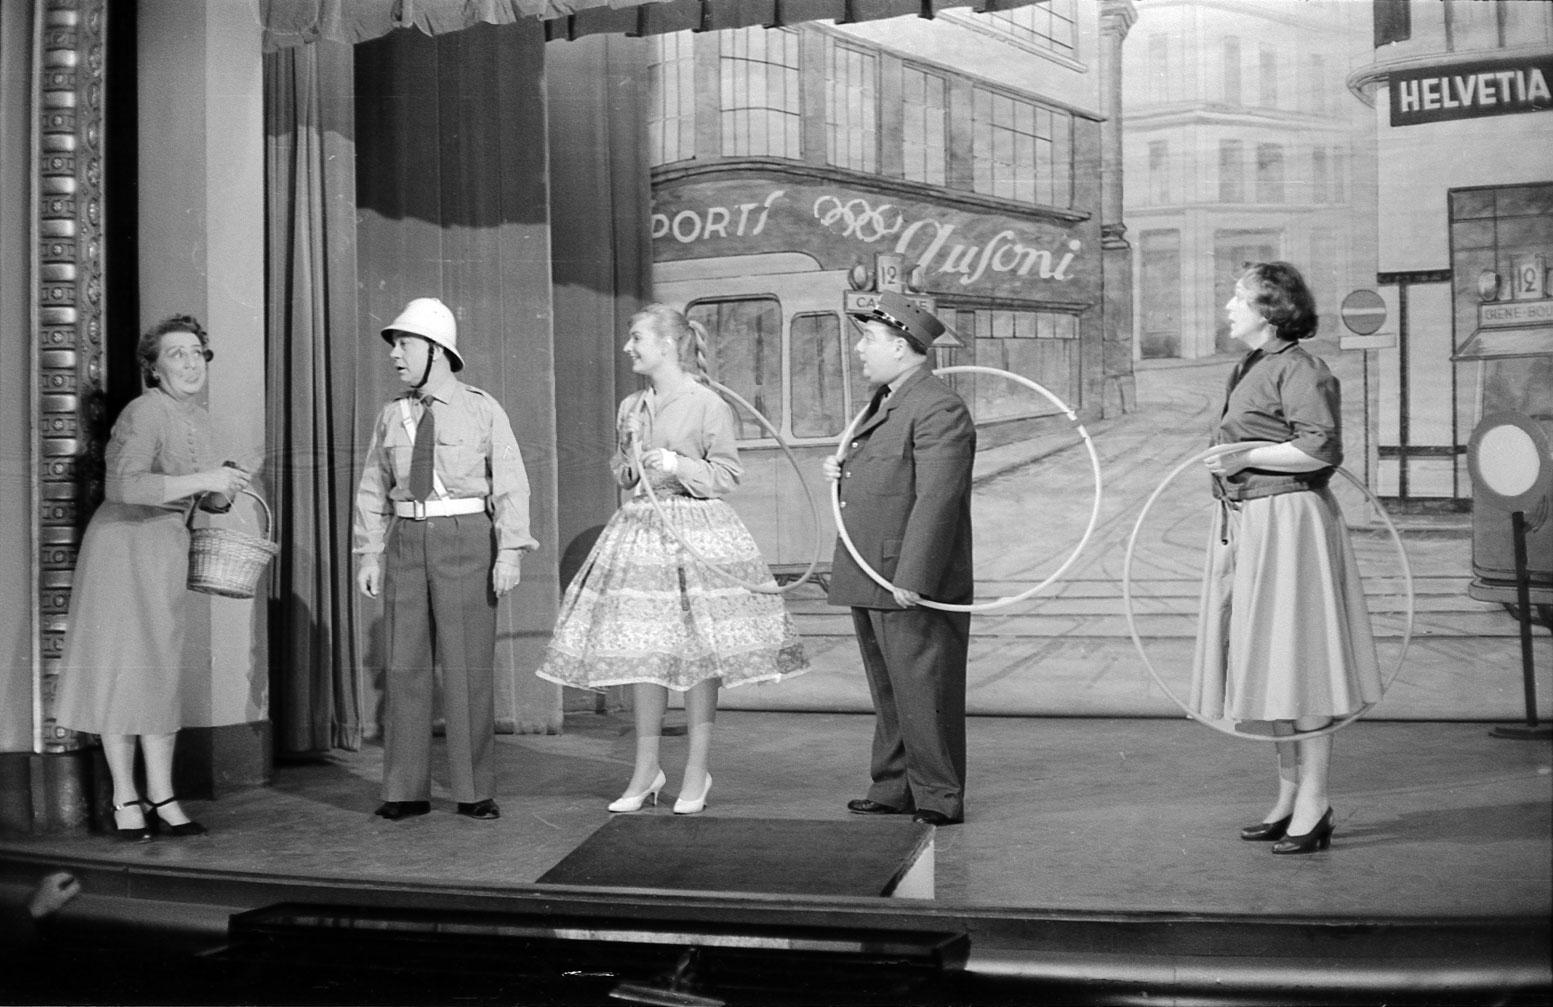 Revue 1959 ©Centre d'iconographie genevoise